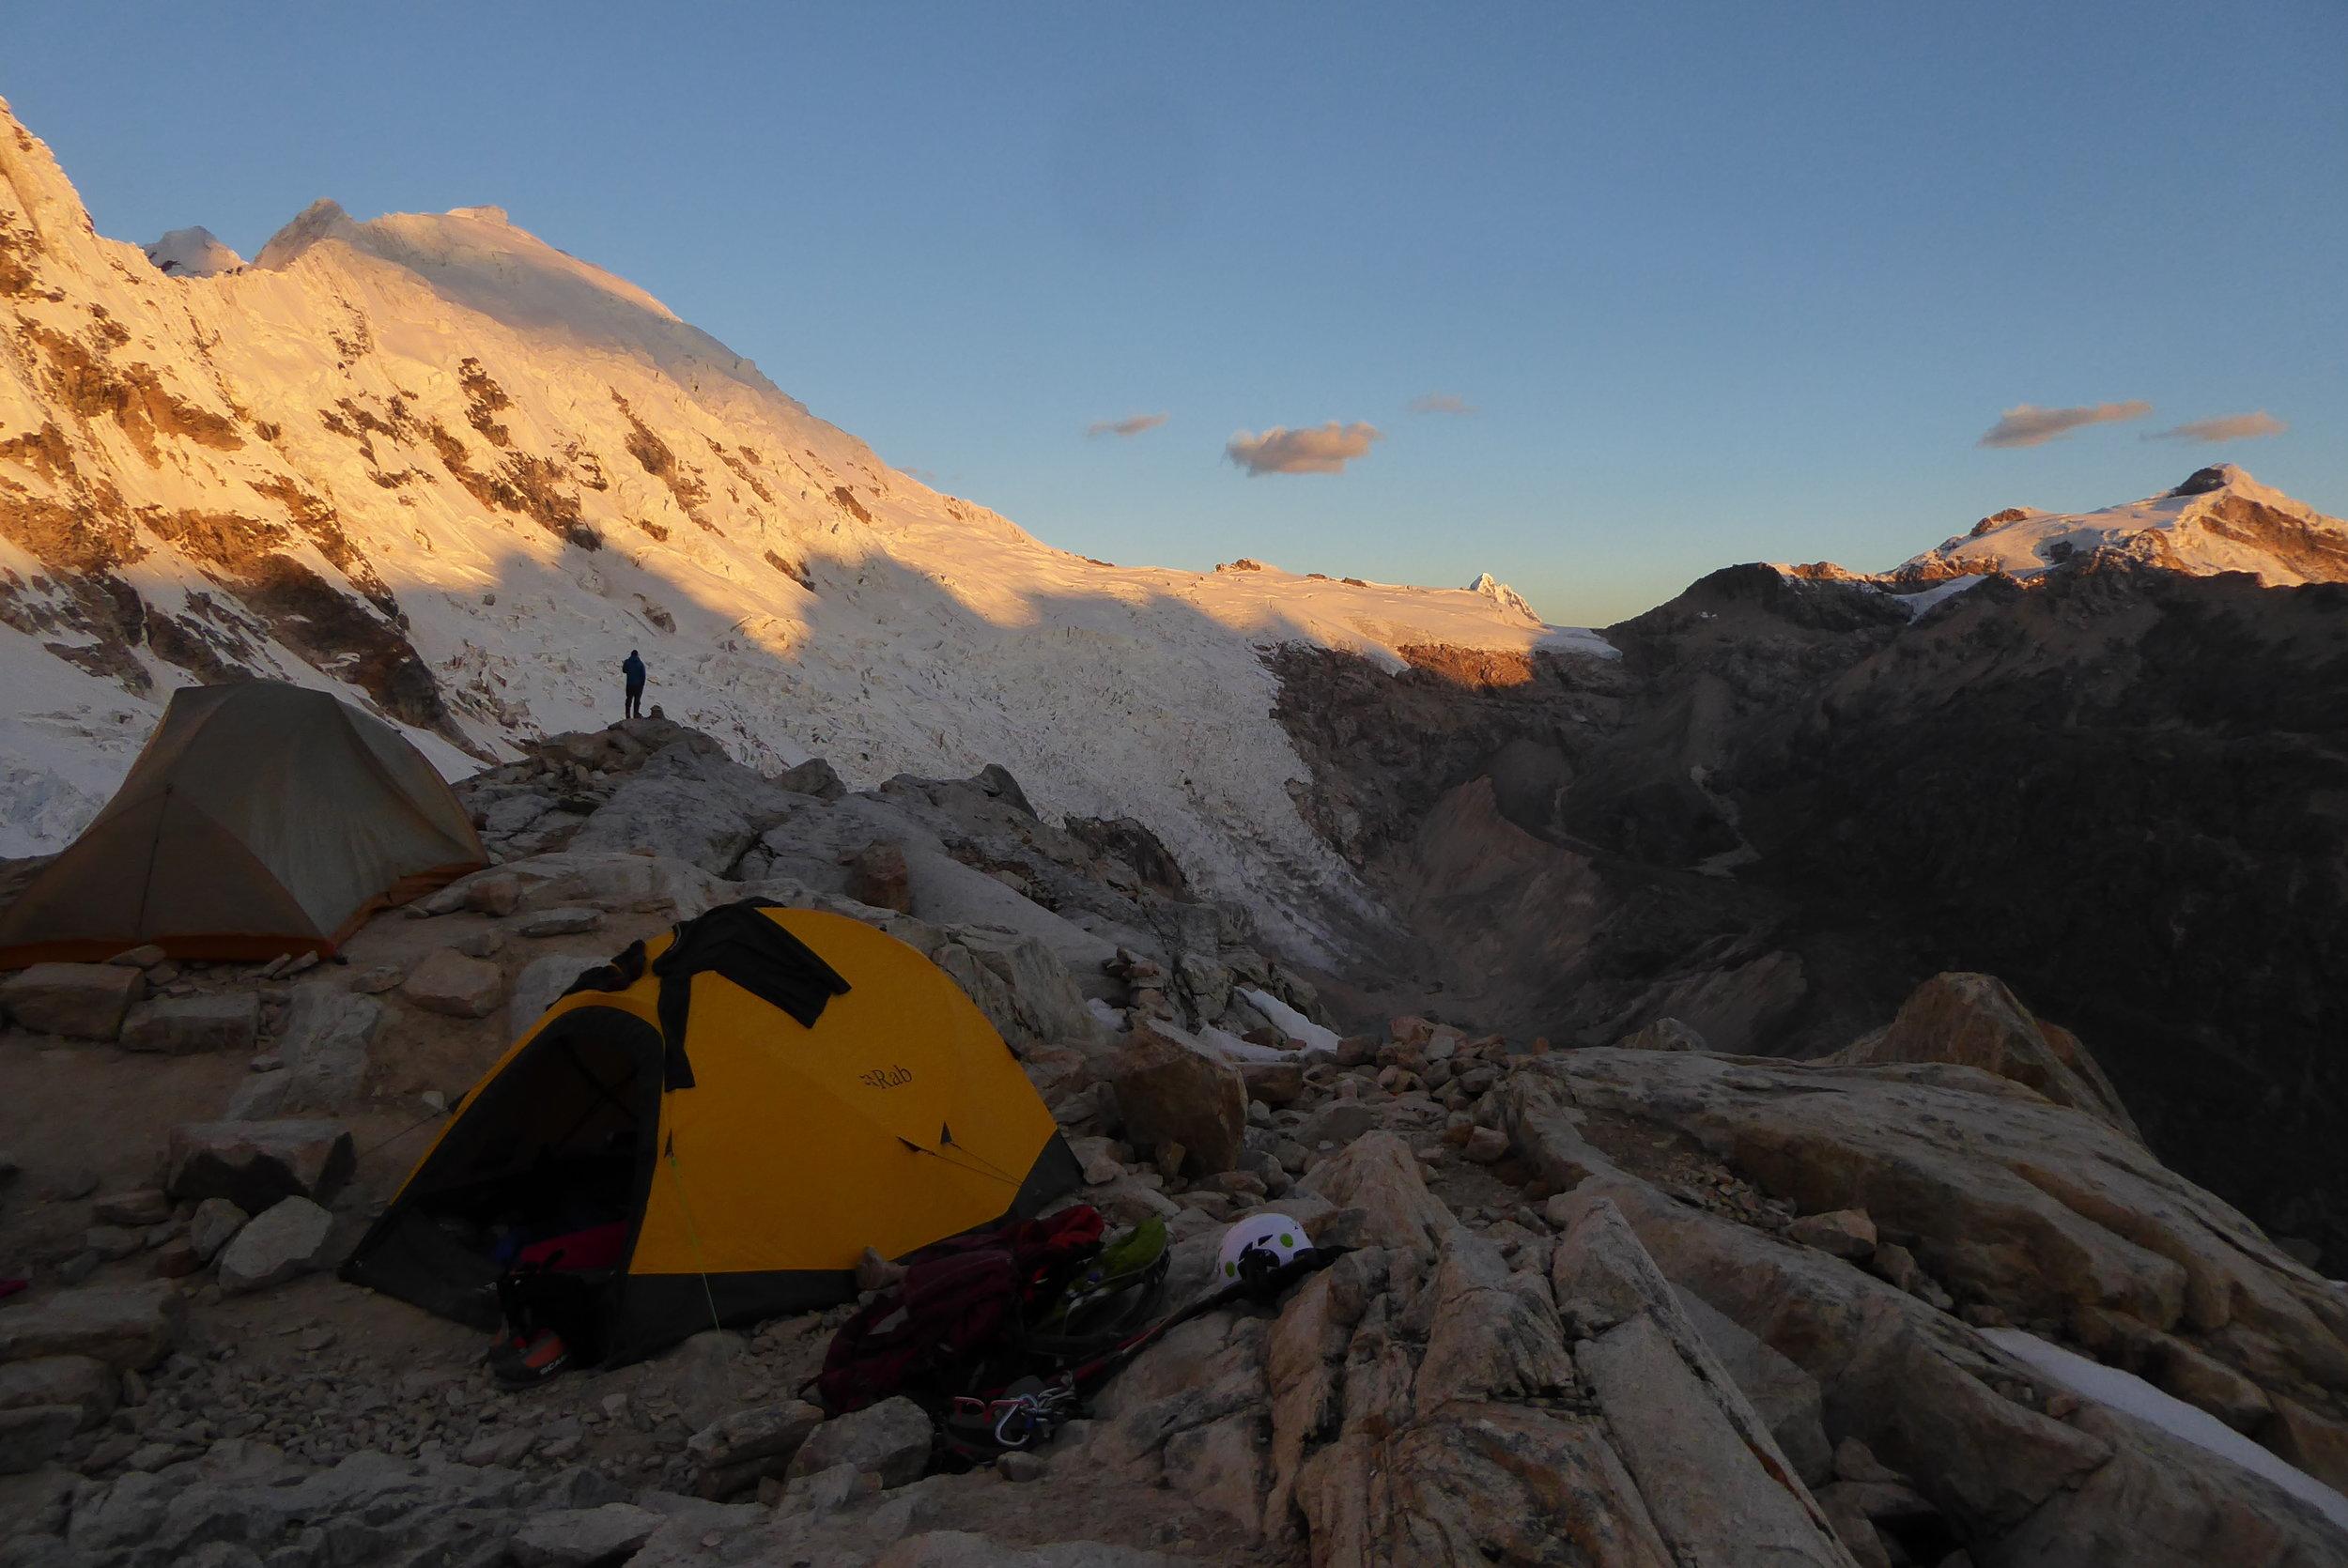 Peru Expedition   Camp high on Tocllaraju's shoulder